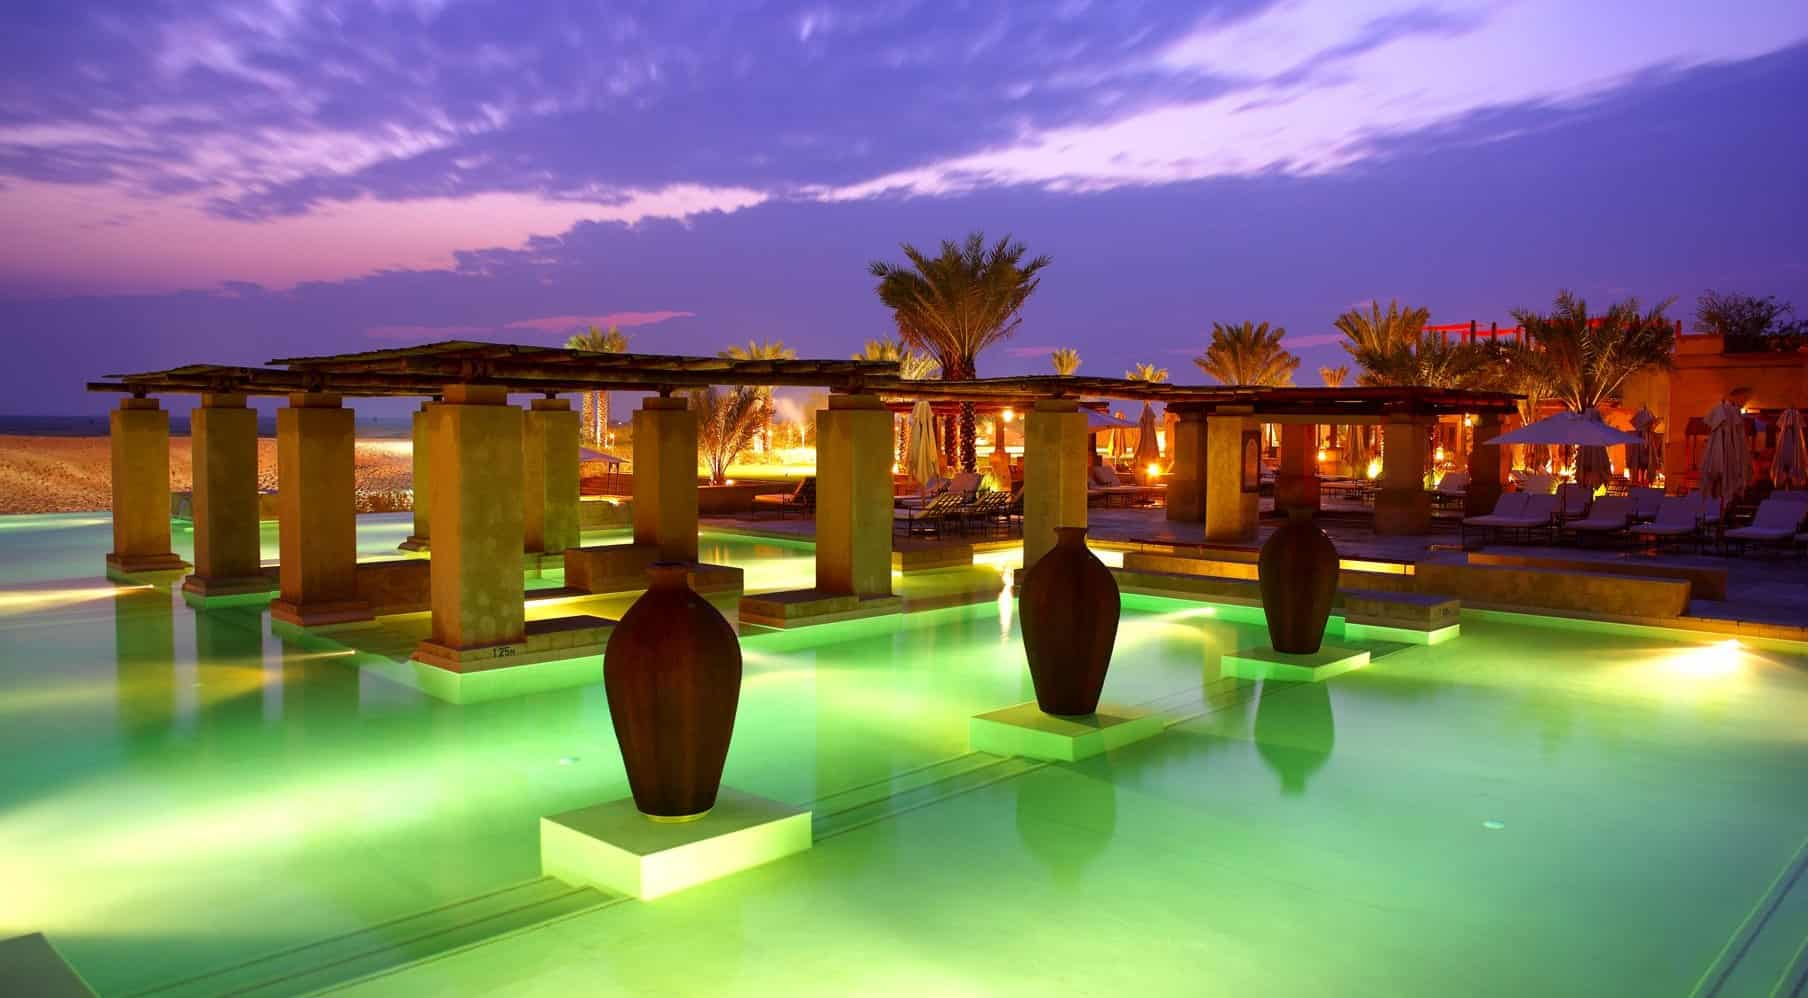 Bab Al Shams Desert Spa Resort Luxury Hotel Dubai The Luxe Voyager